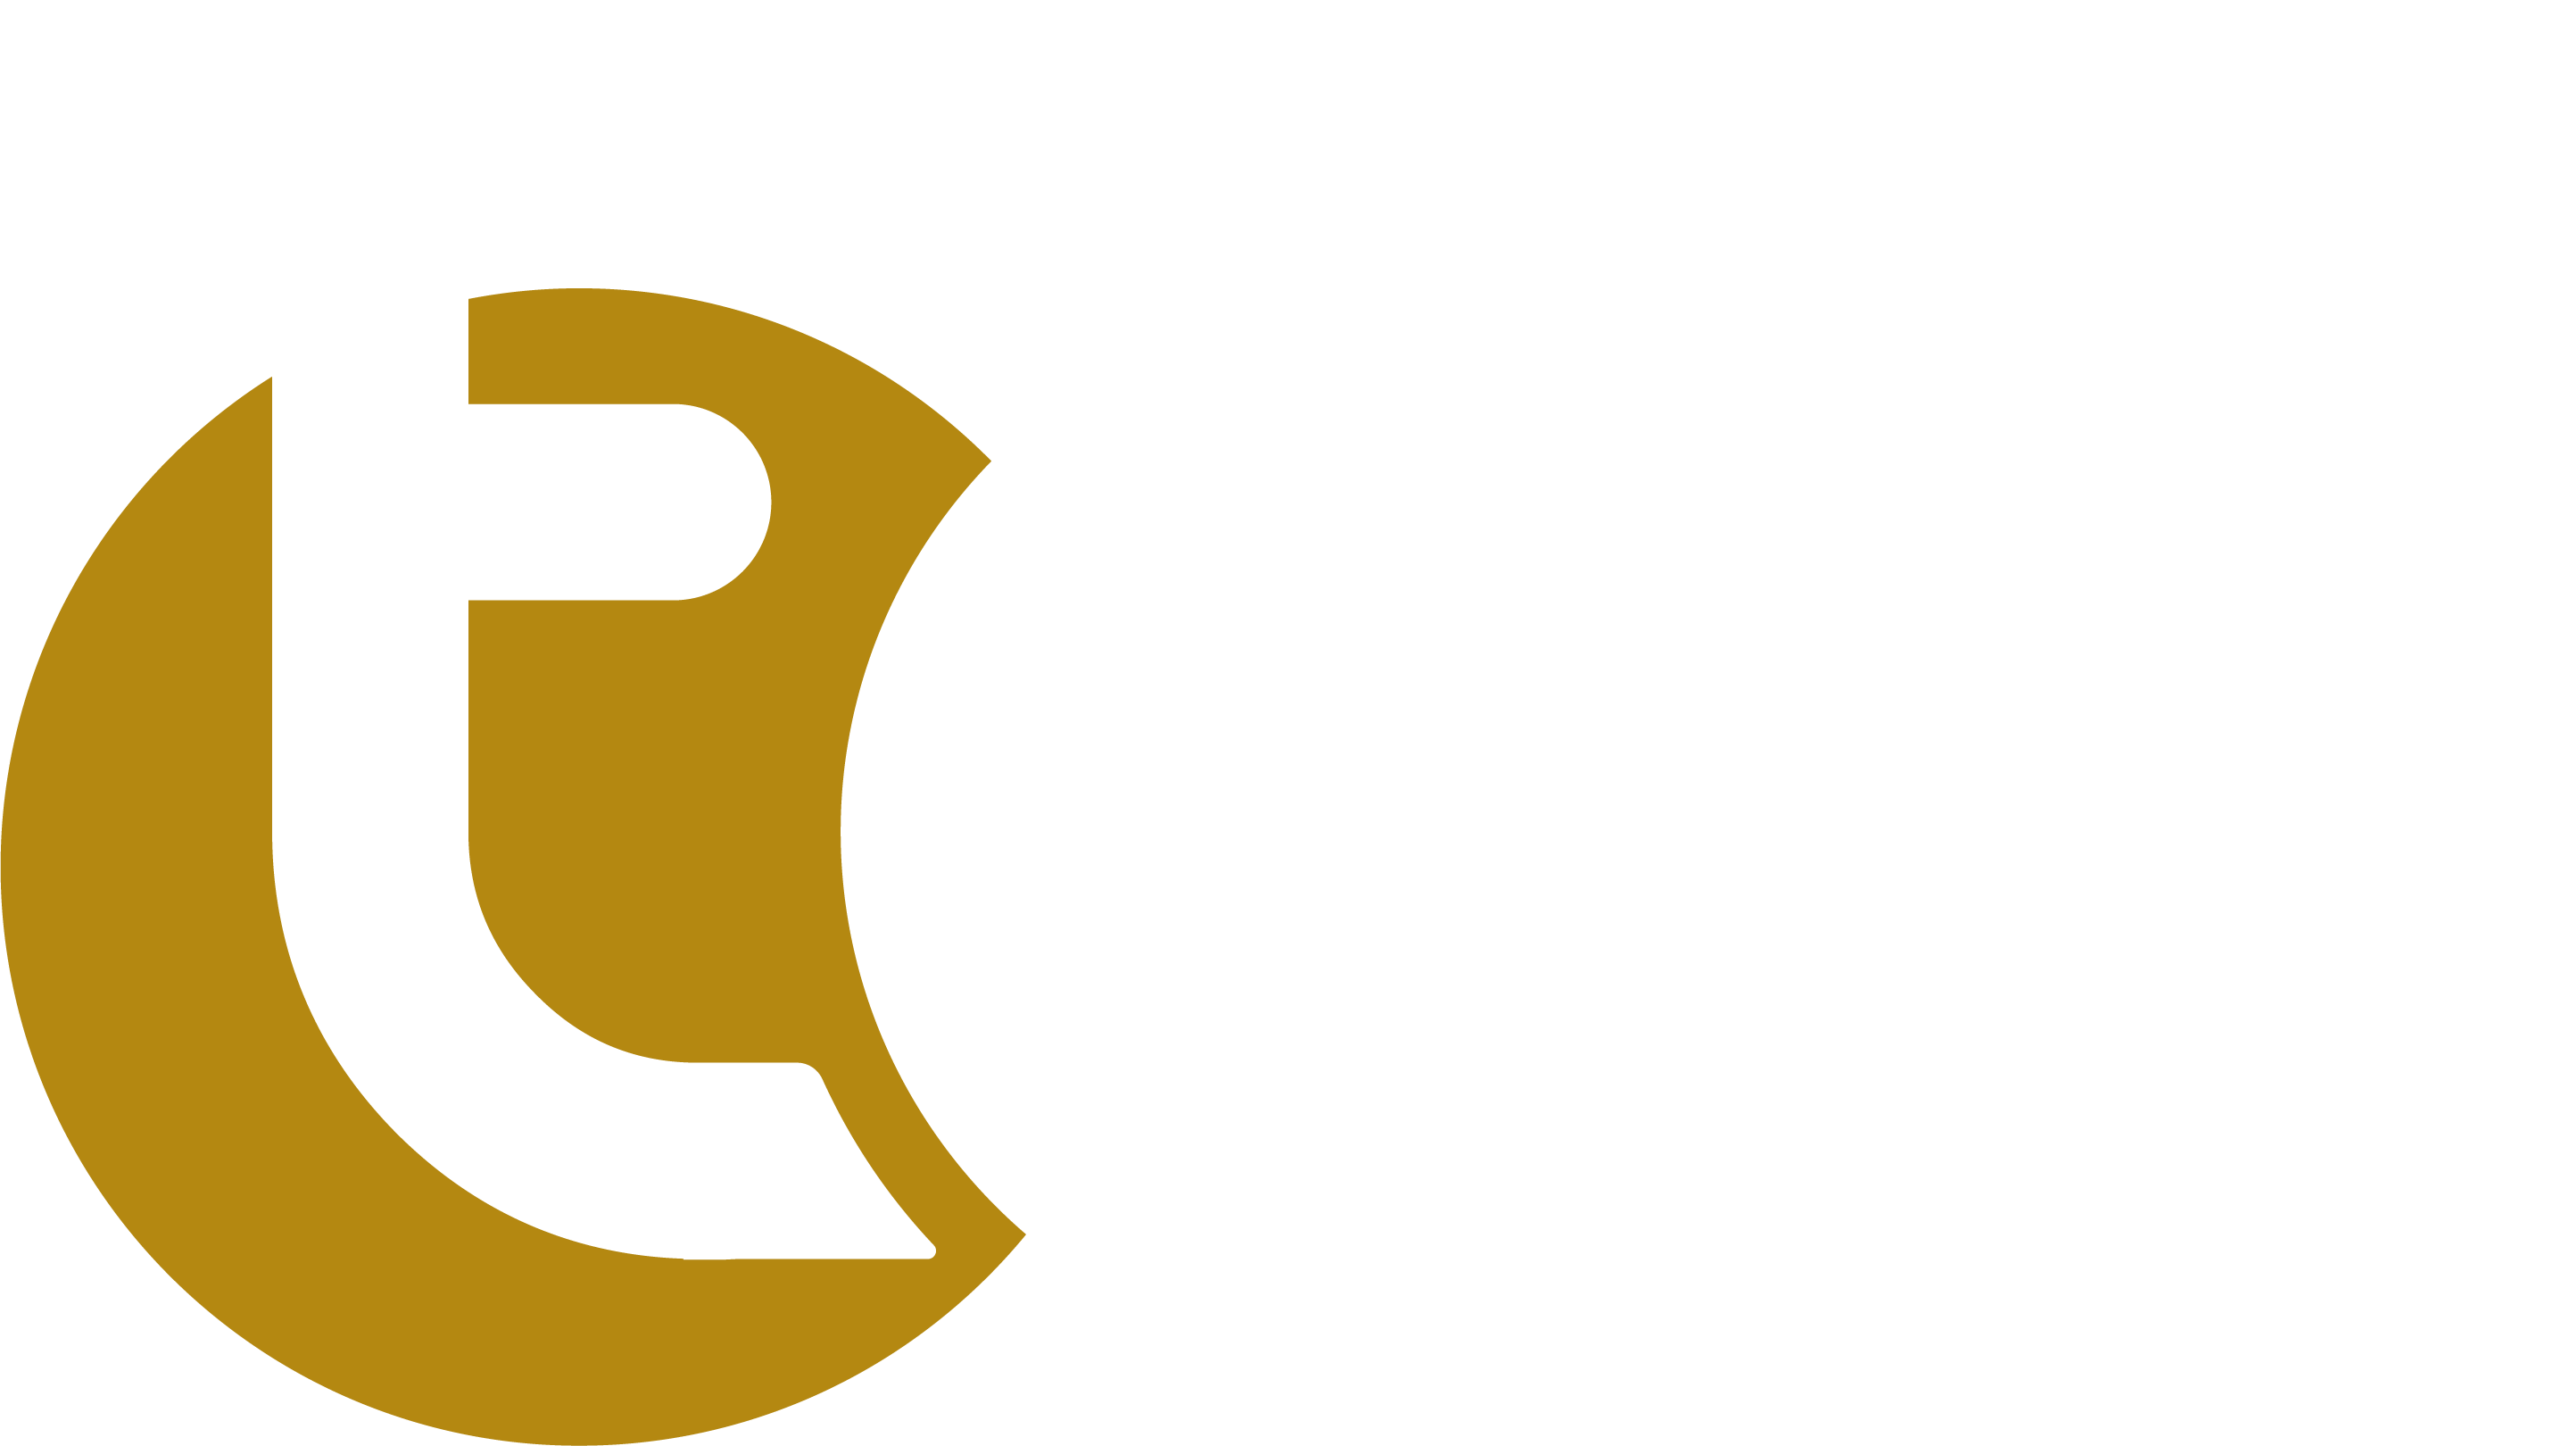 The Tōk Case